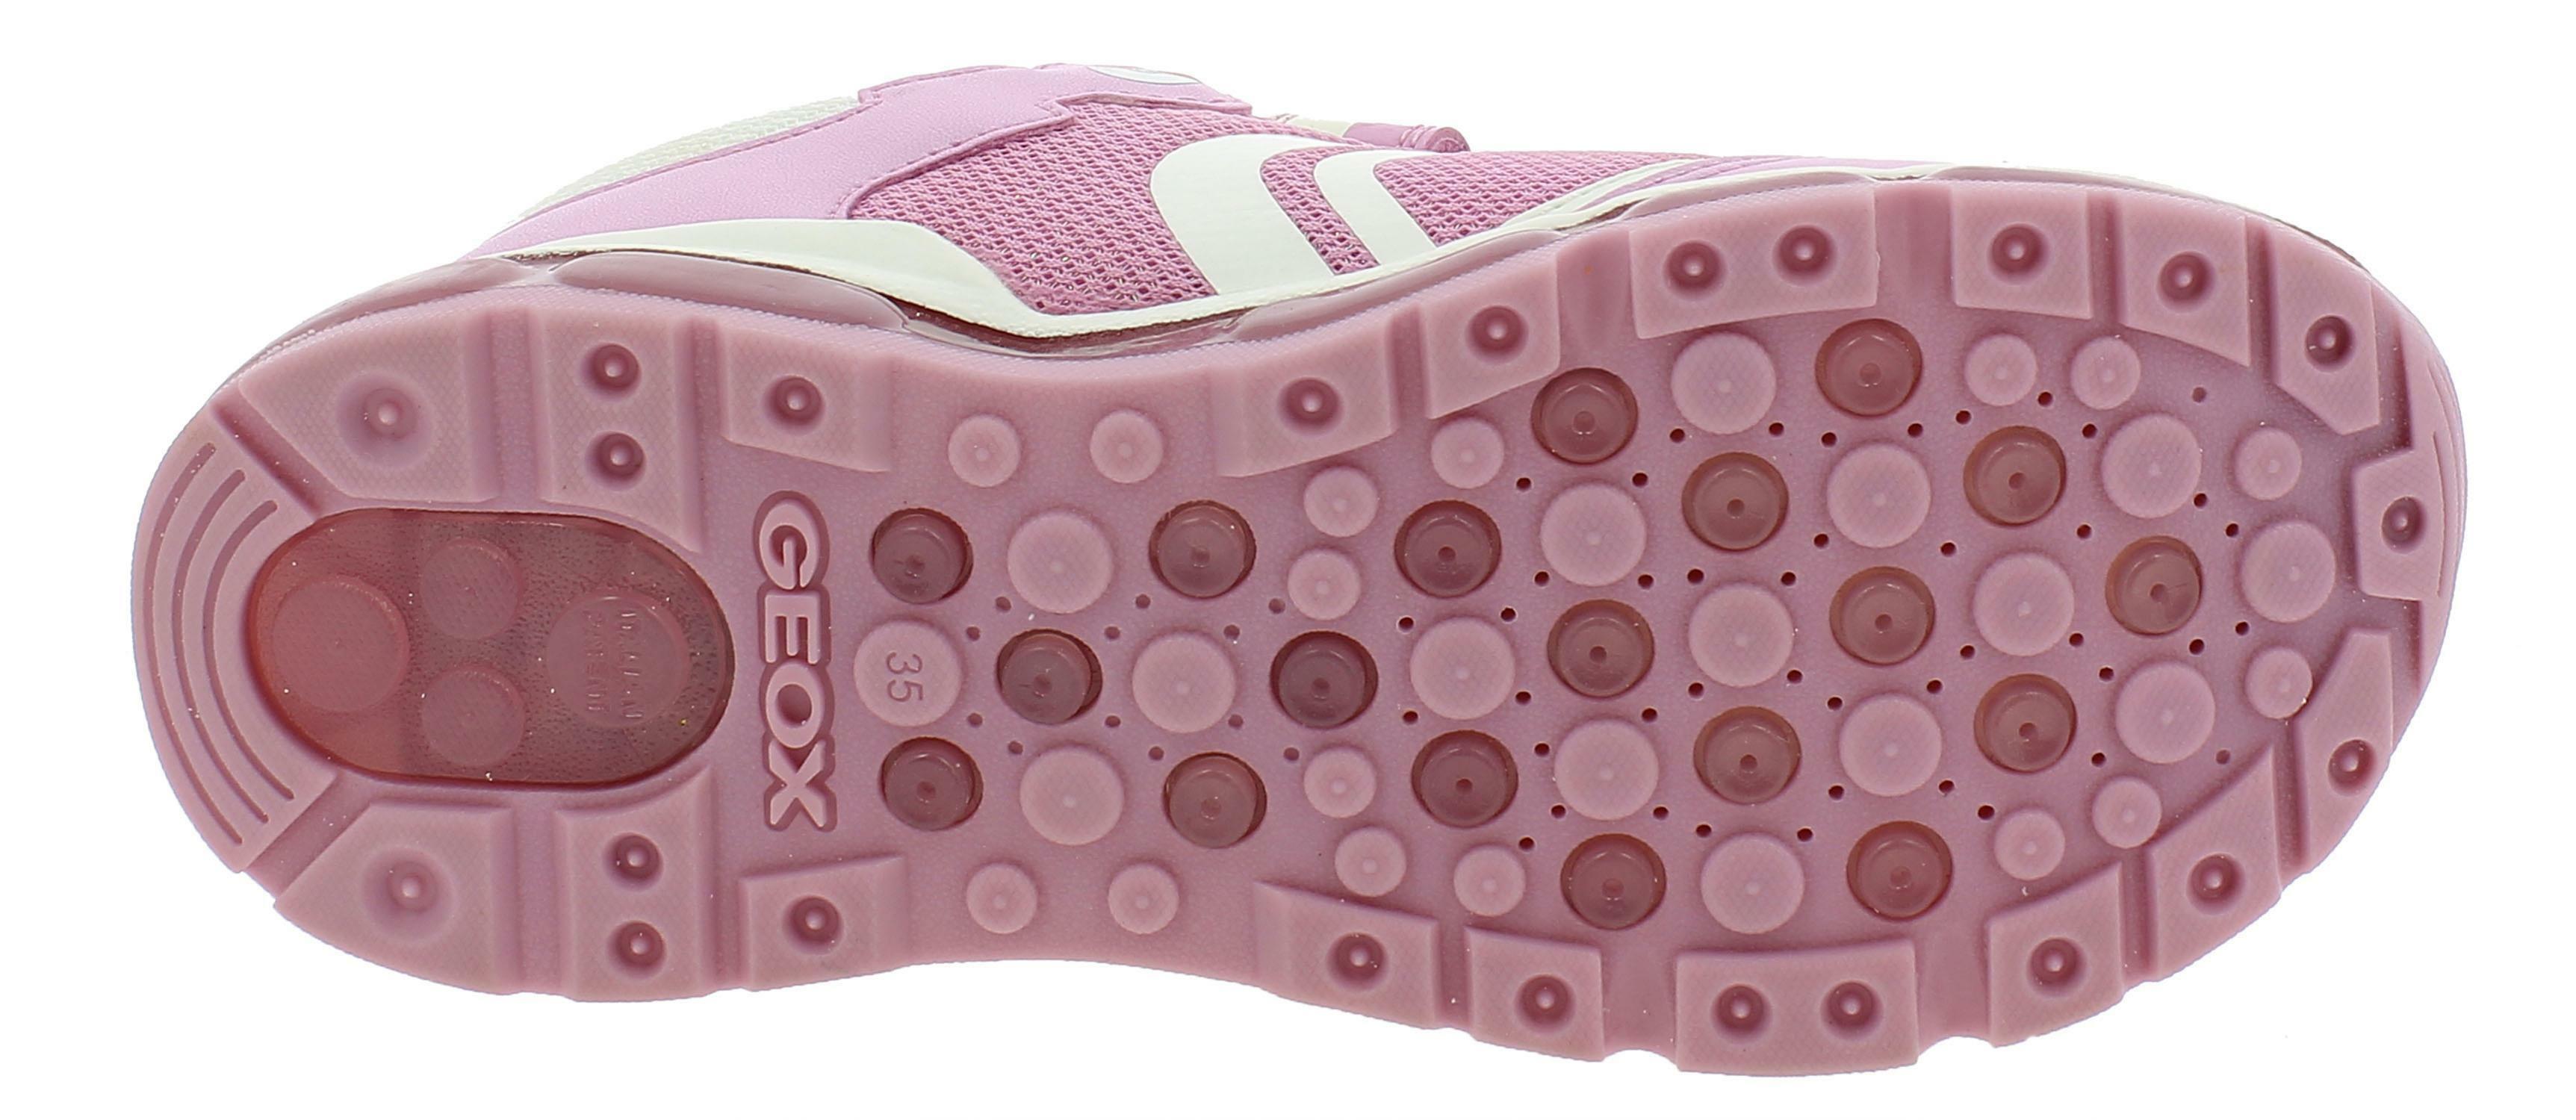 geox j android g scarpe sportive bambina rosa j9245bc0550